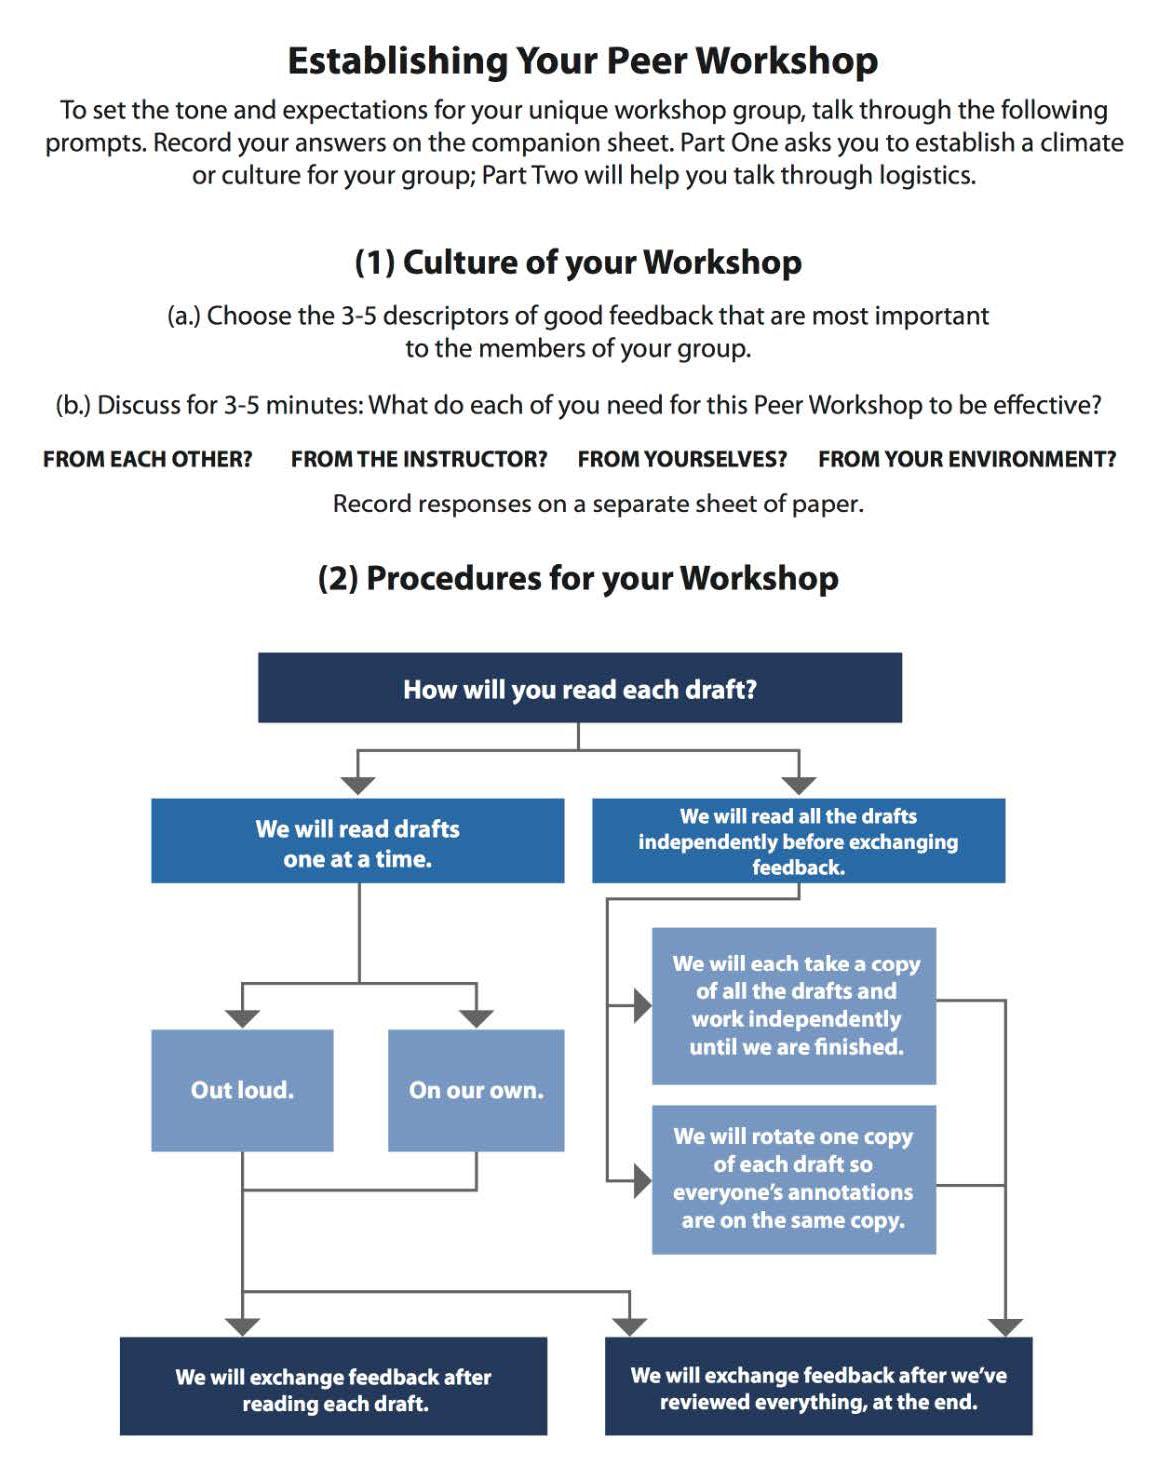 Establishing Your Peer Workshop worksheet. For accessible version, contact pdxscholar@pdx.edu.